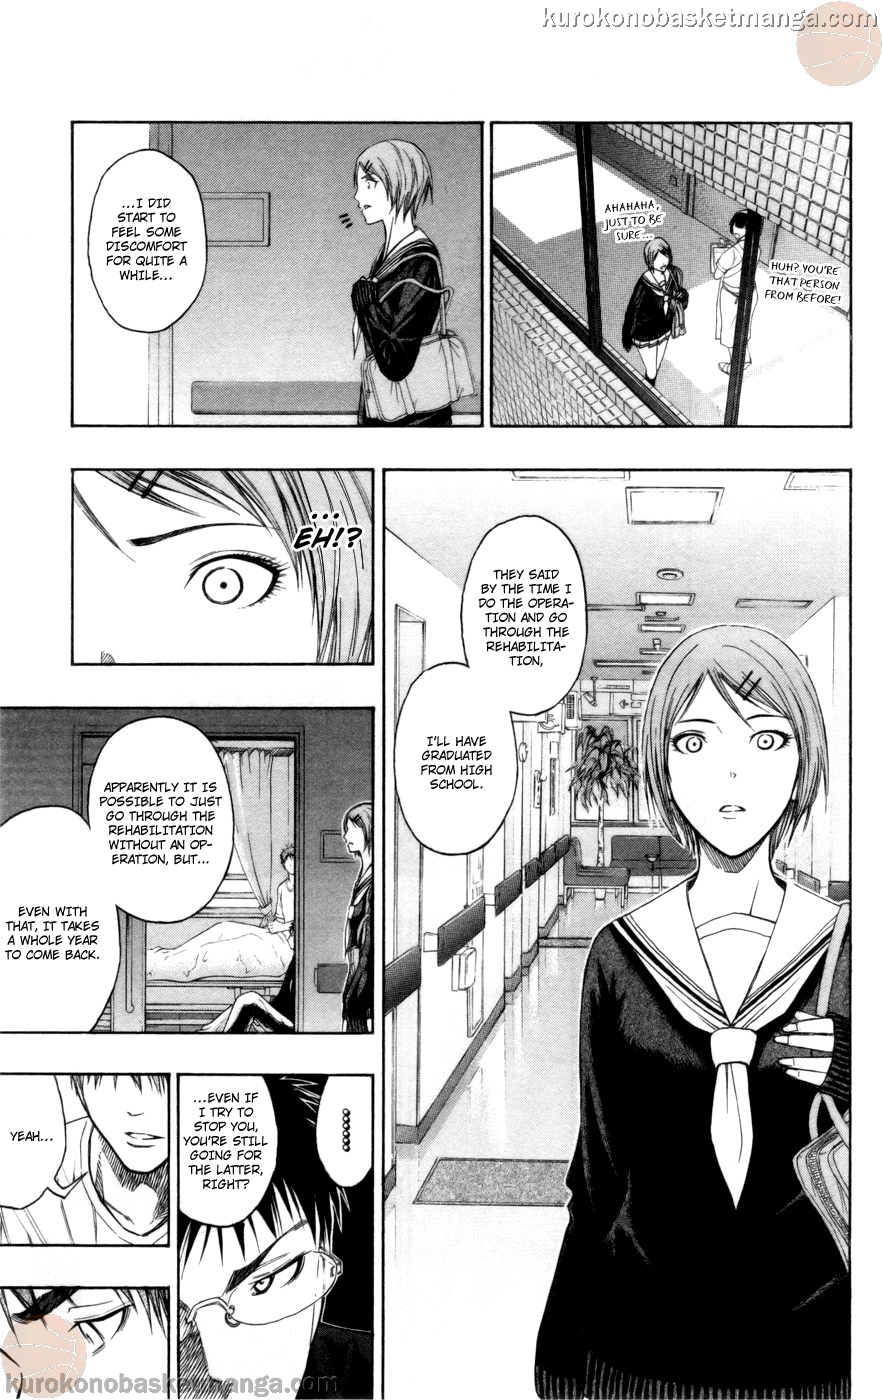 Kuroko no Basket Manga Chapter 99 - Image 16